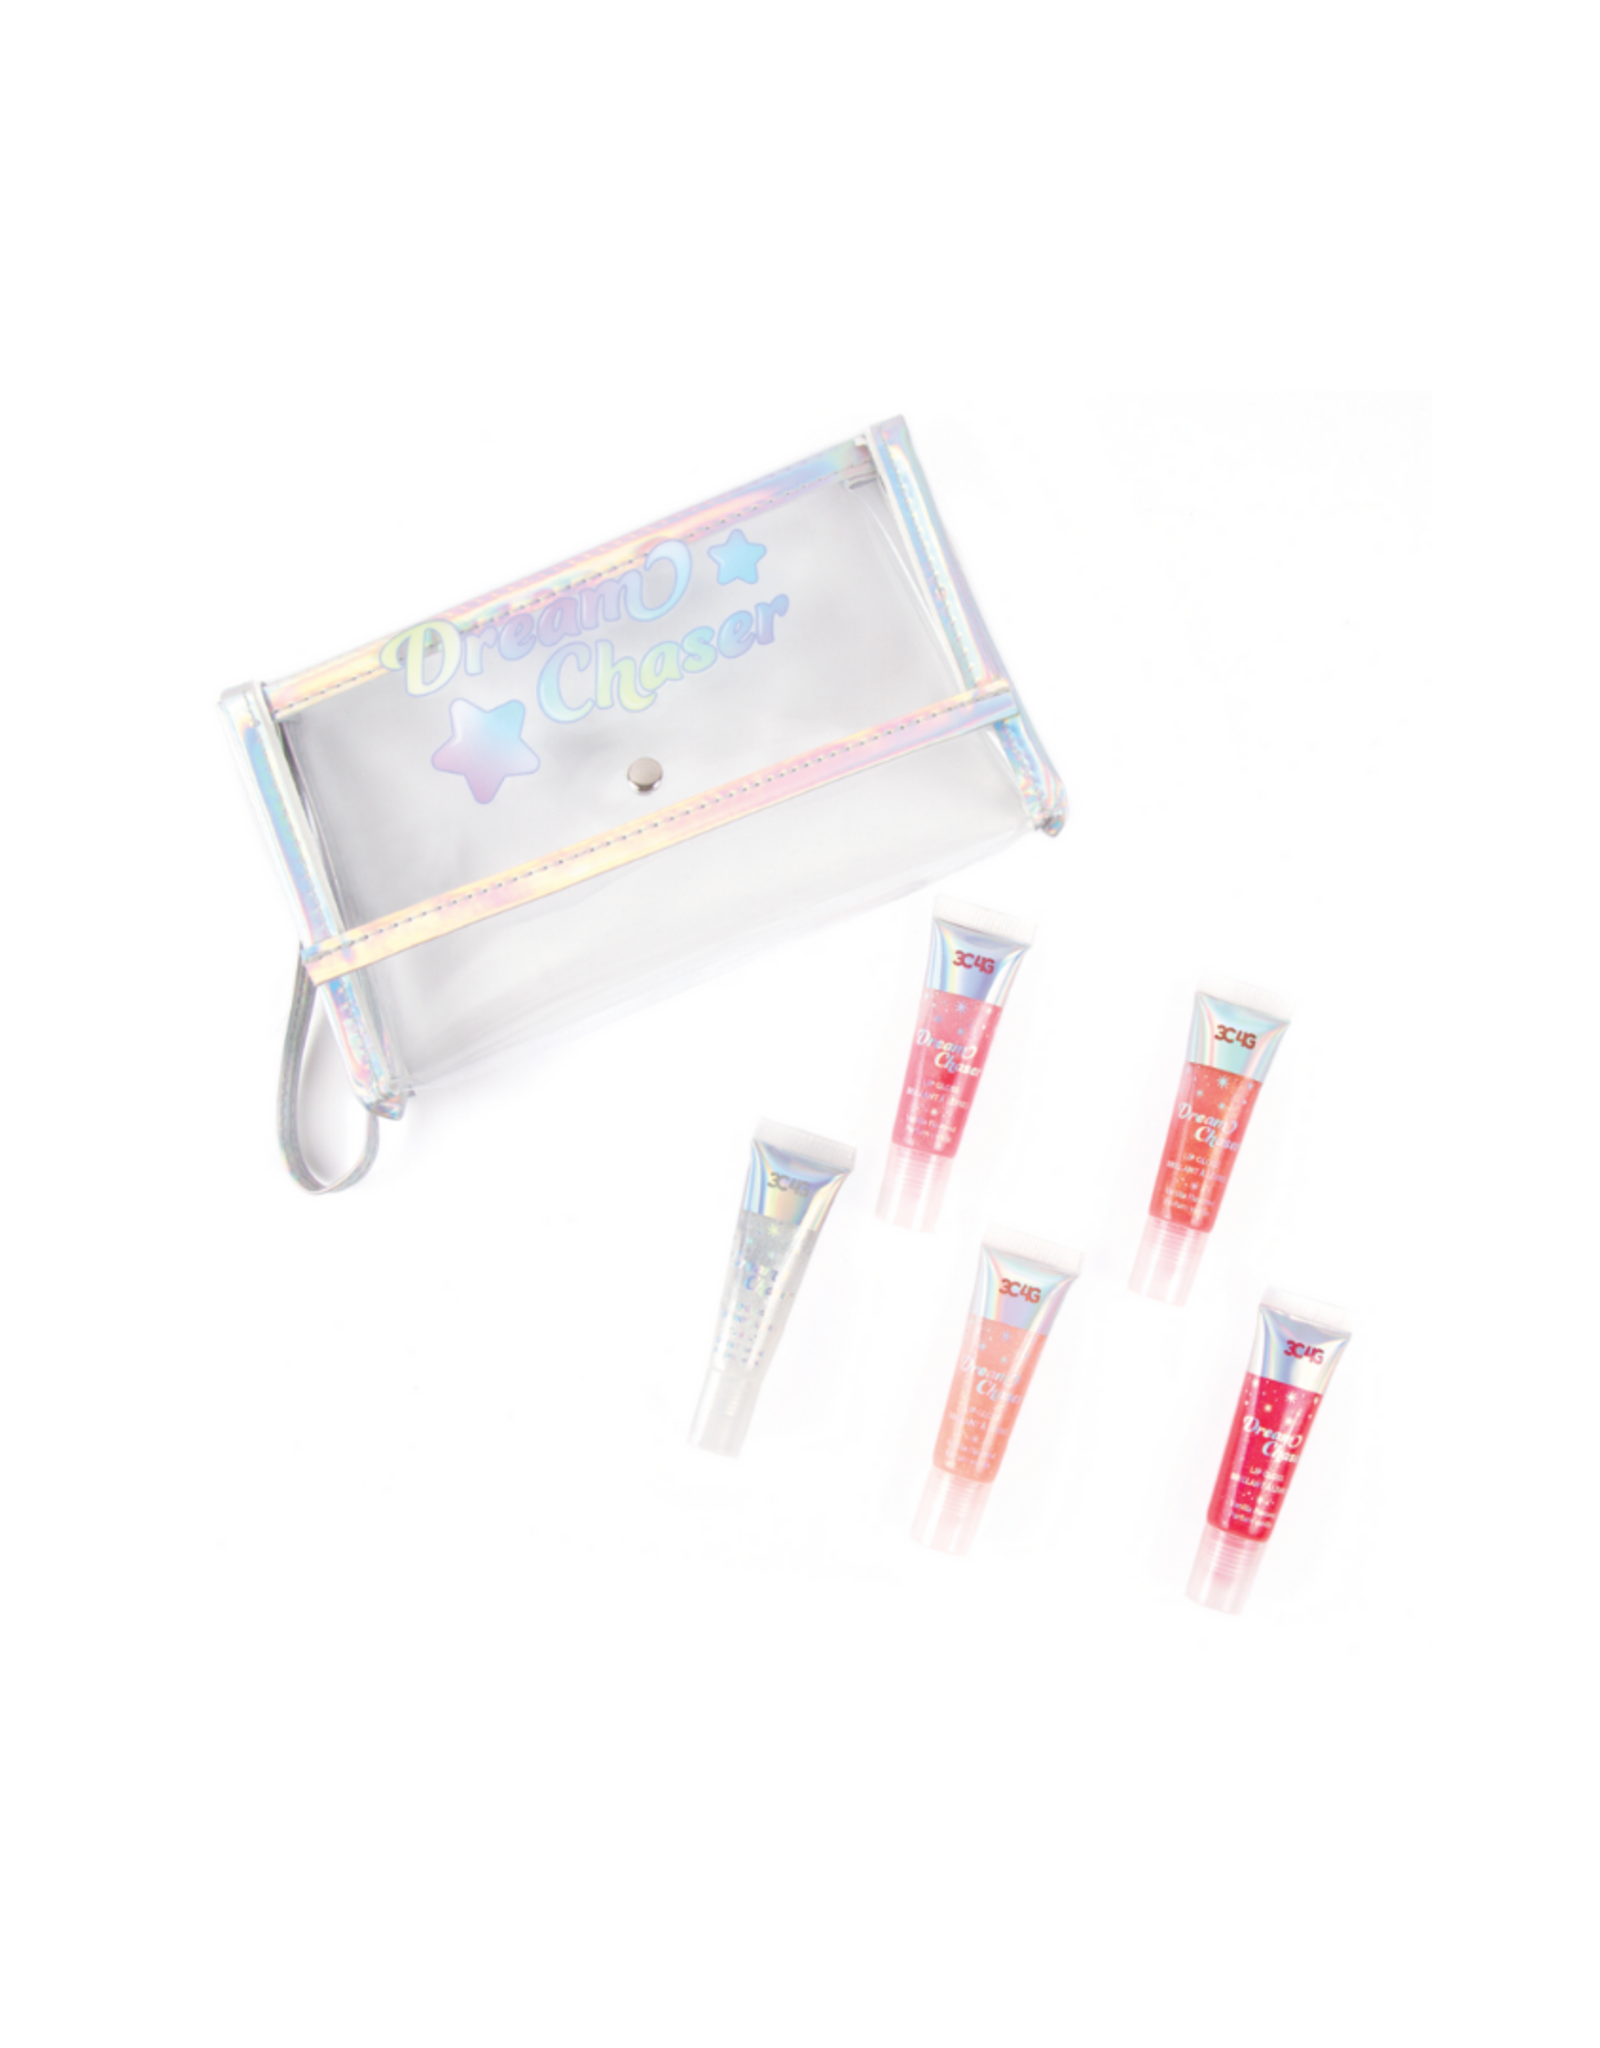 3C4G Holowave Lip Gloss 5pk